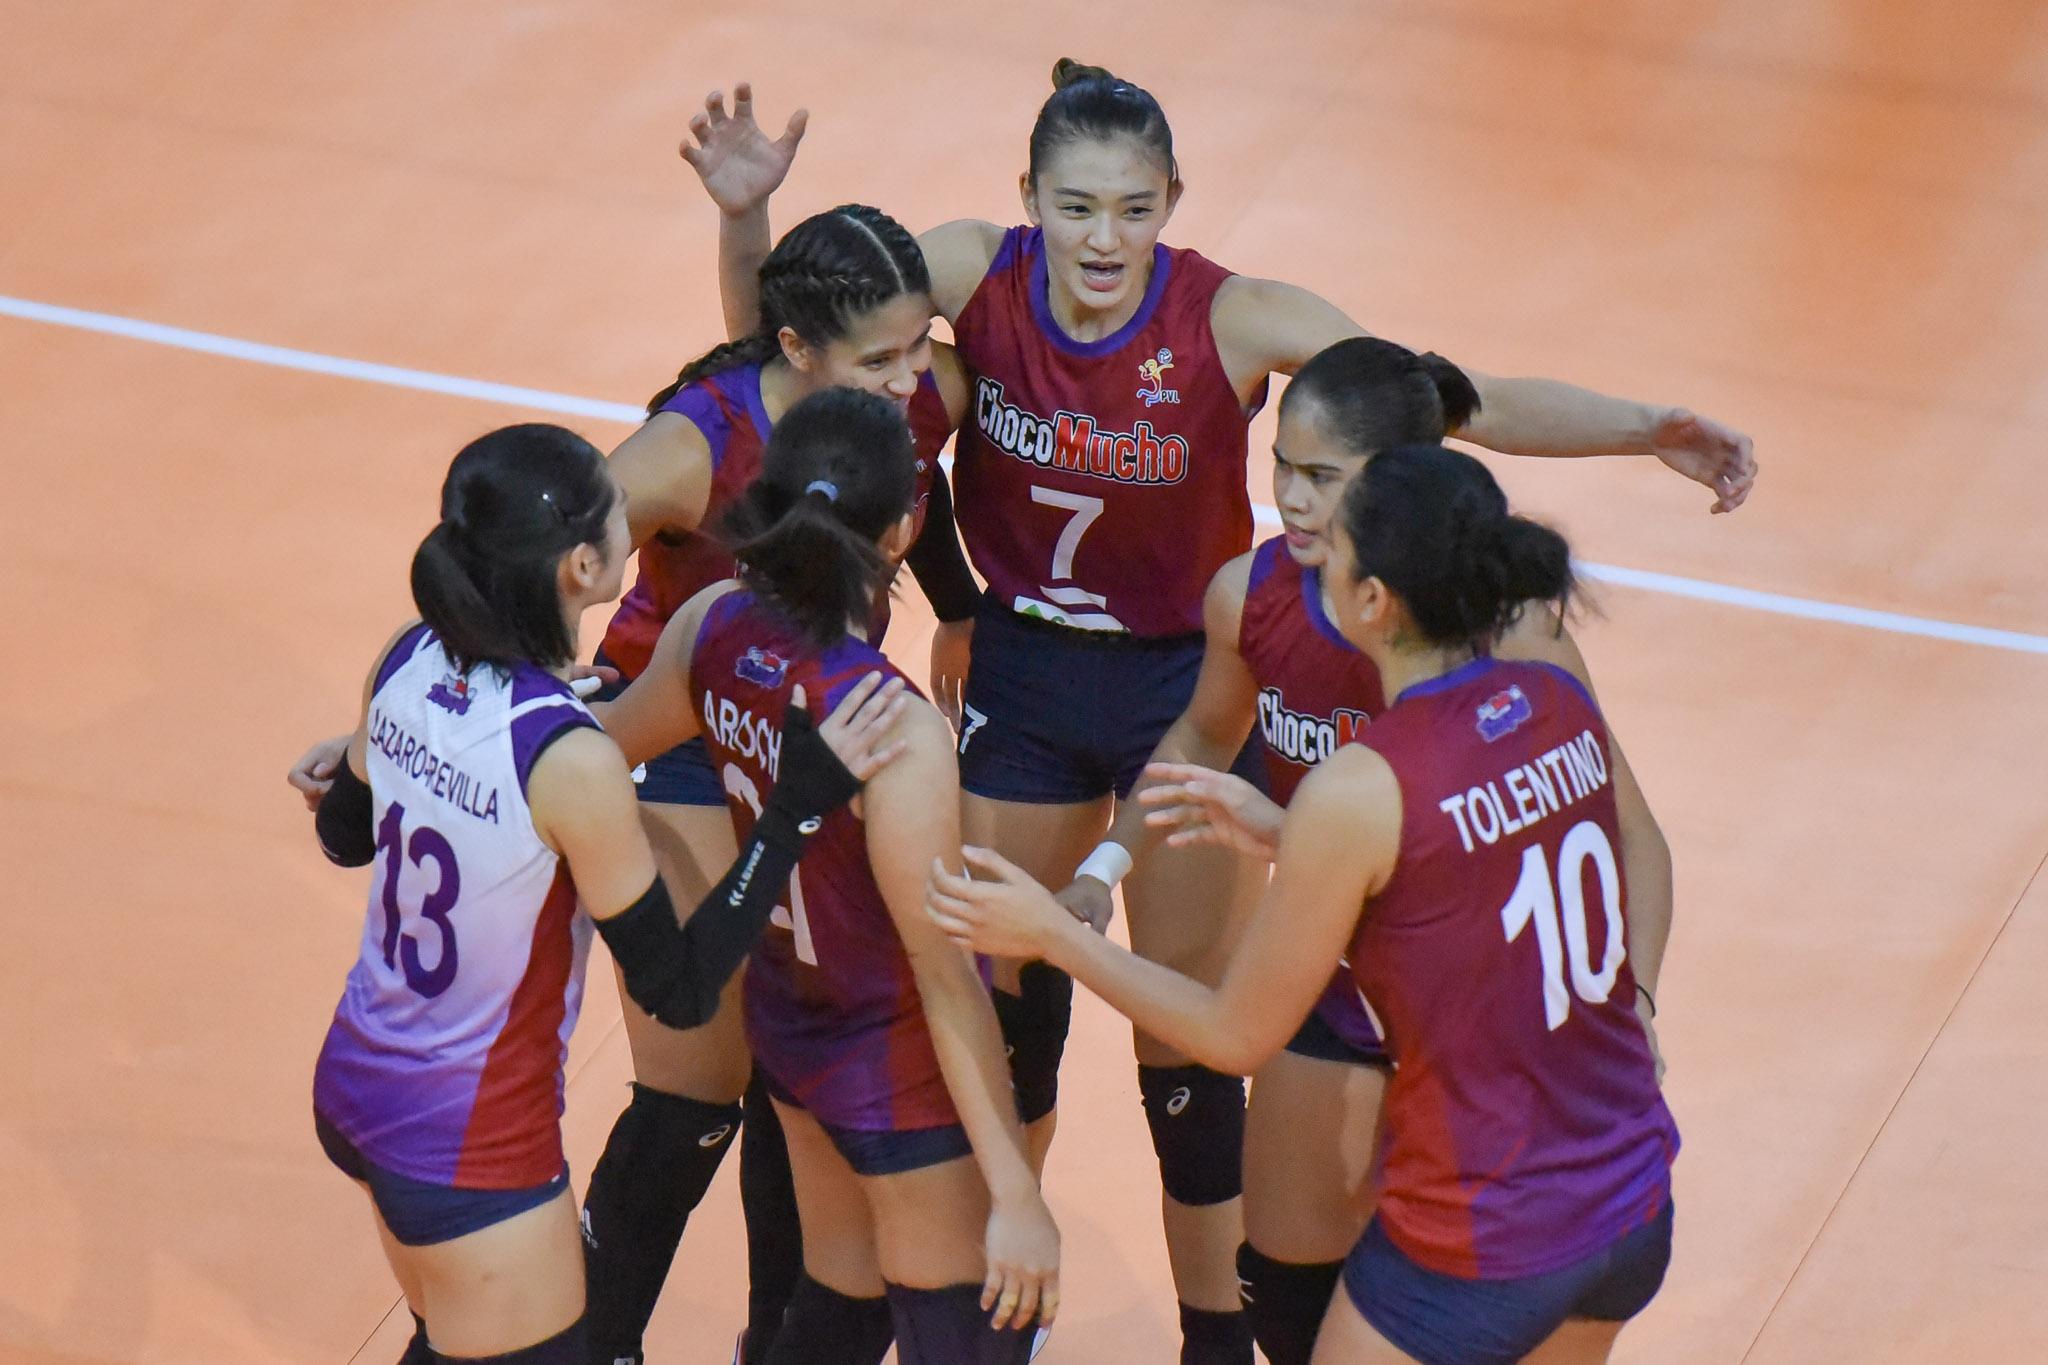 2021-PVL-Open-Creamline-vs.-Choco-Mucho-Maddie-Madayag-7530 Almadro says Choco Mucho lacked 'maturity' in Creamline loss News PVL Volleyball  - philippine sports news